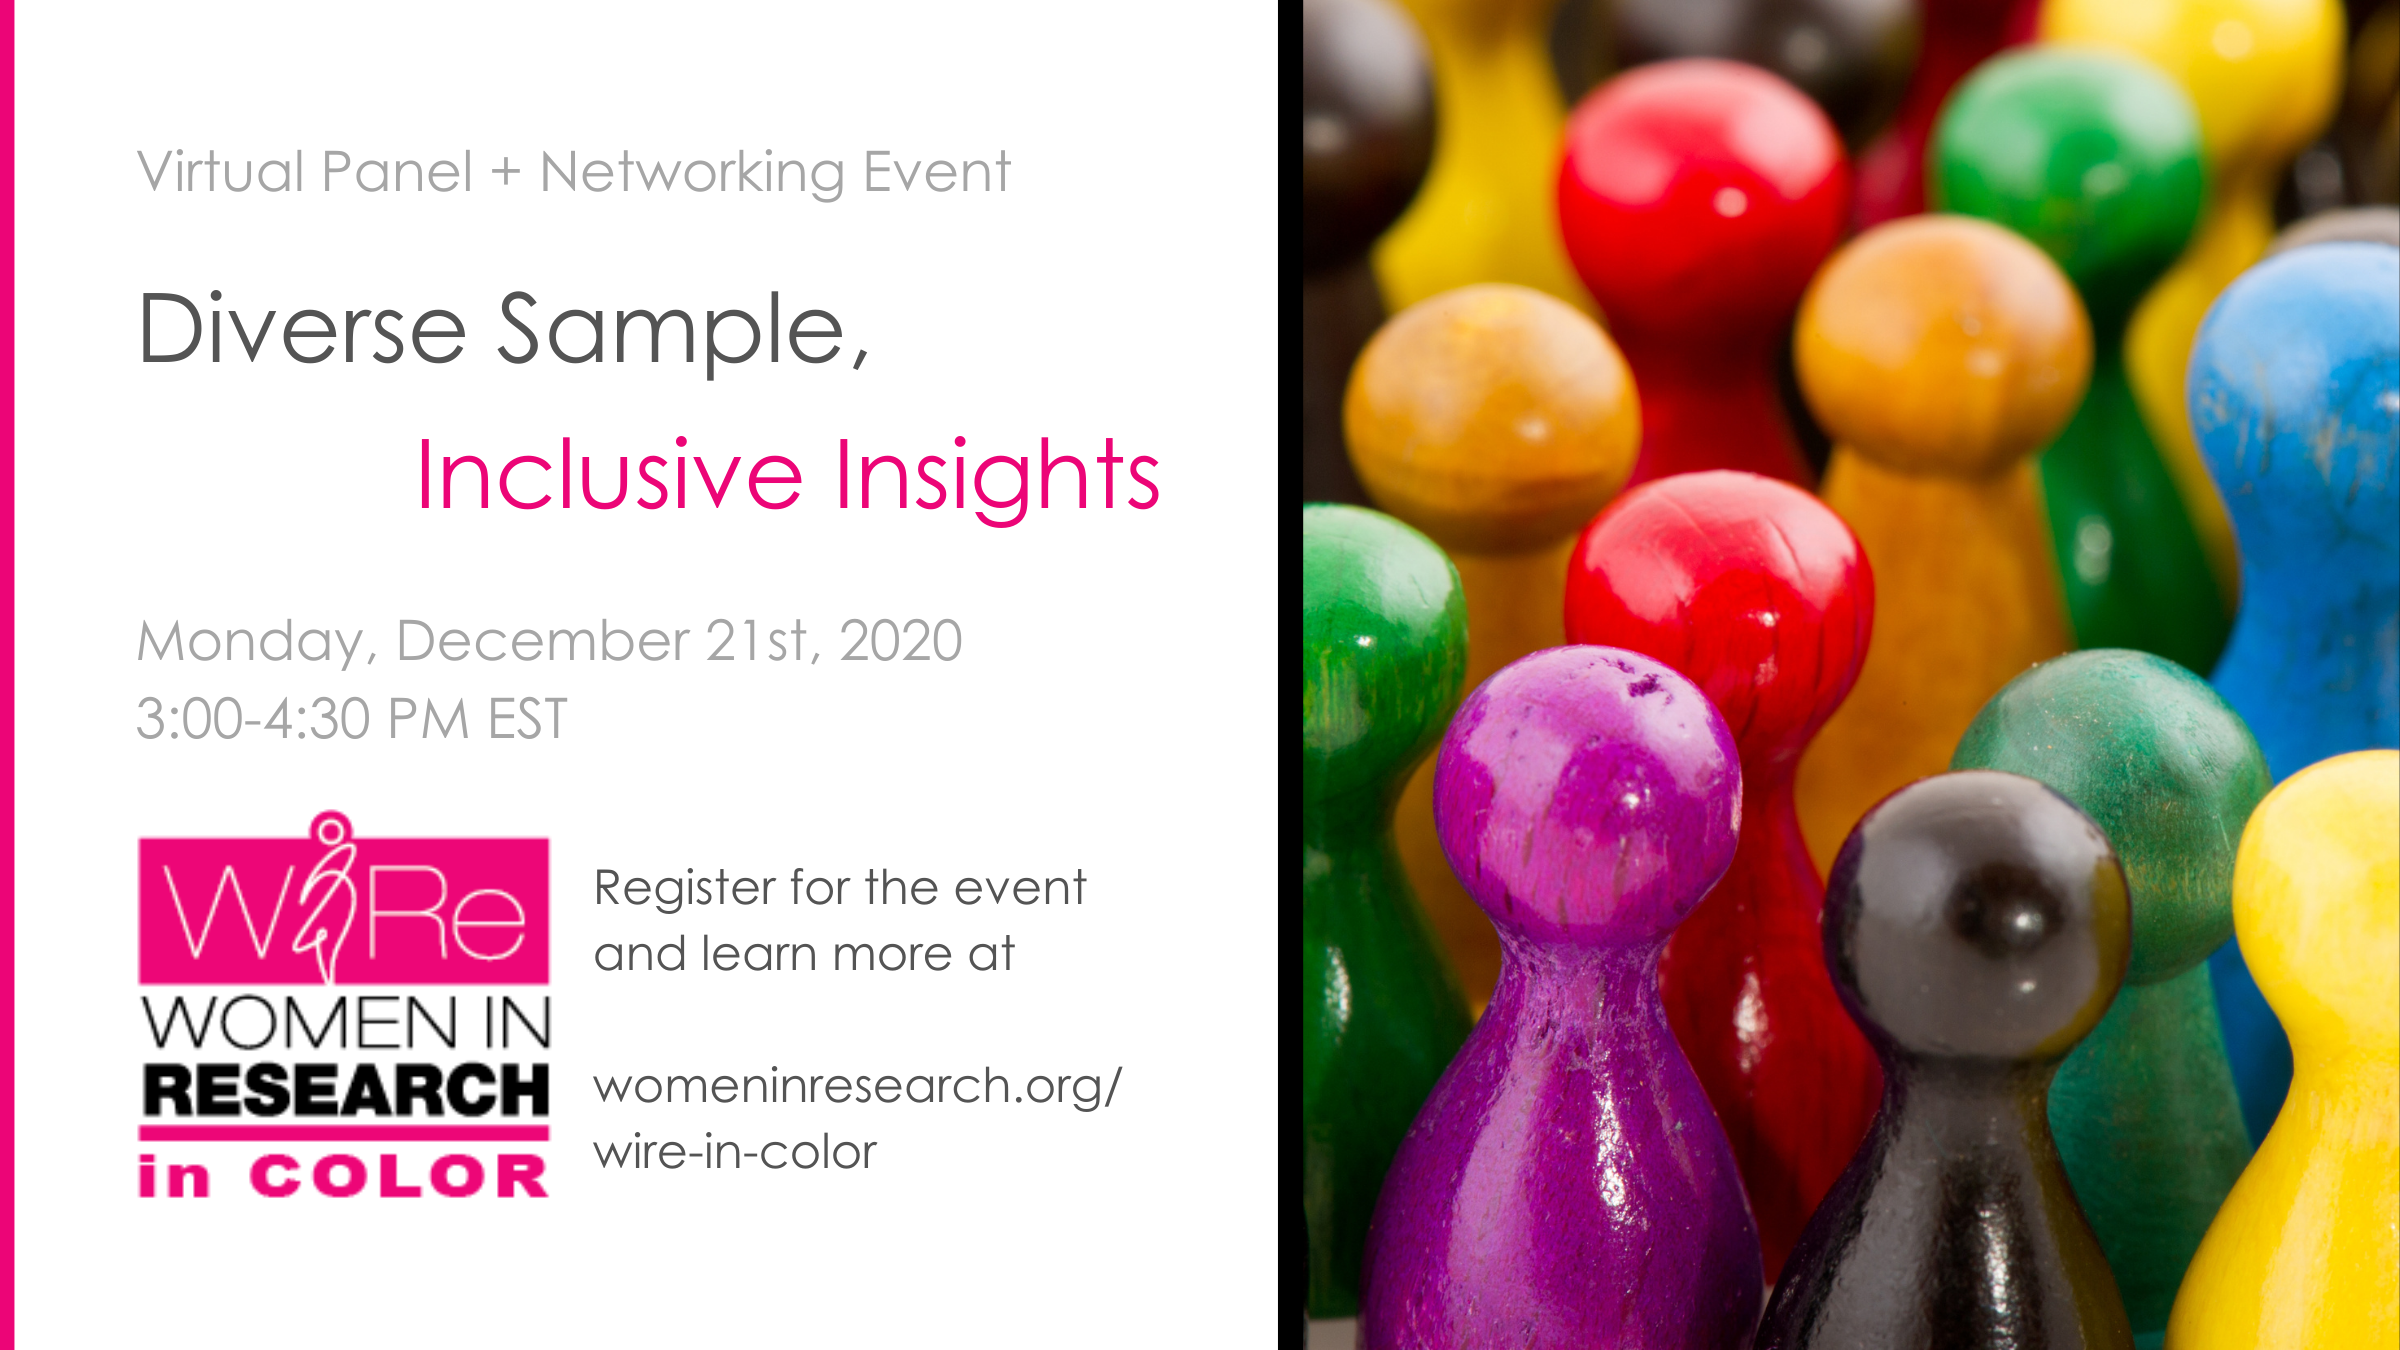 Diverse Sample, Inclusive Insights